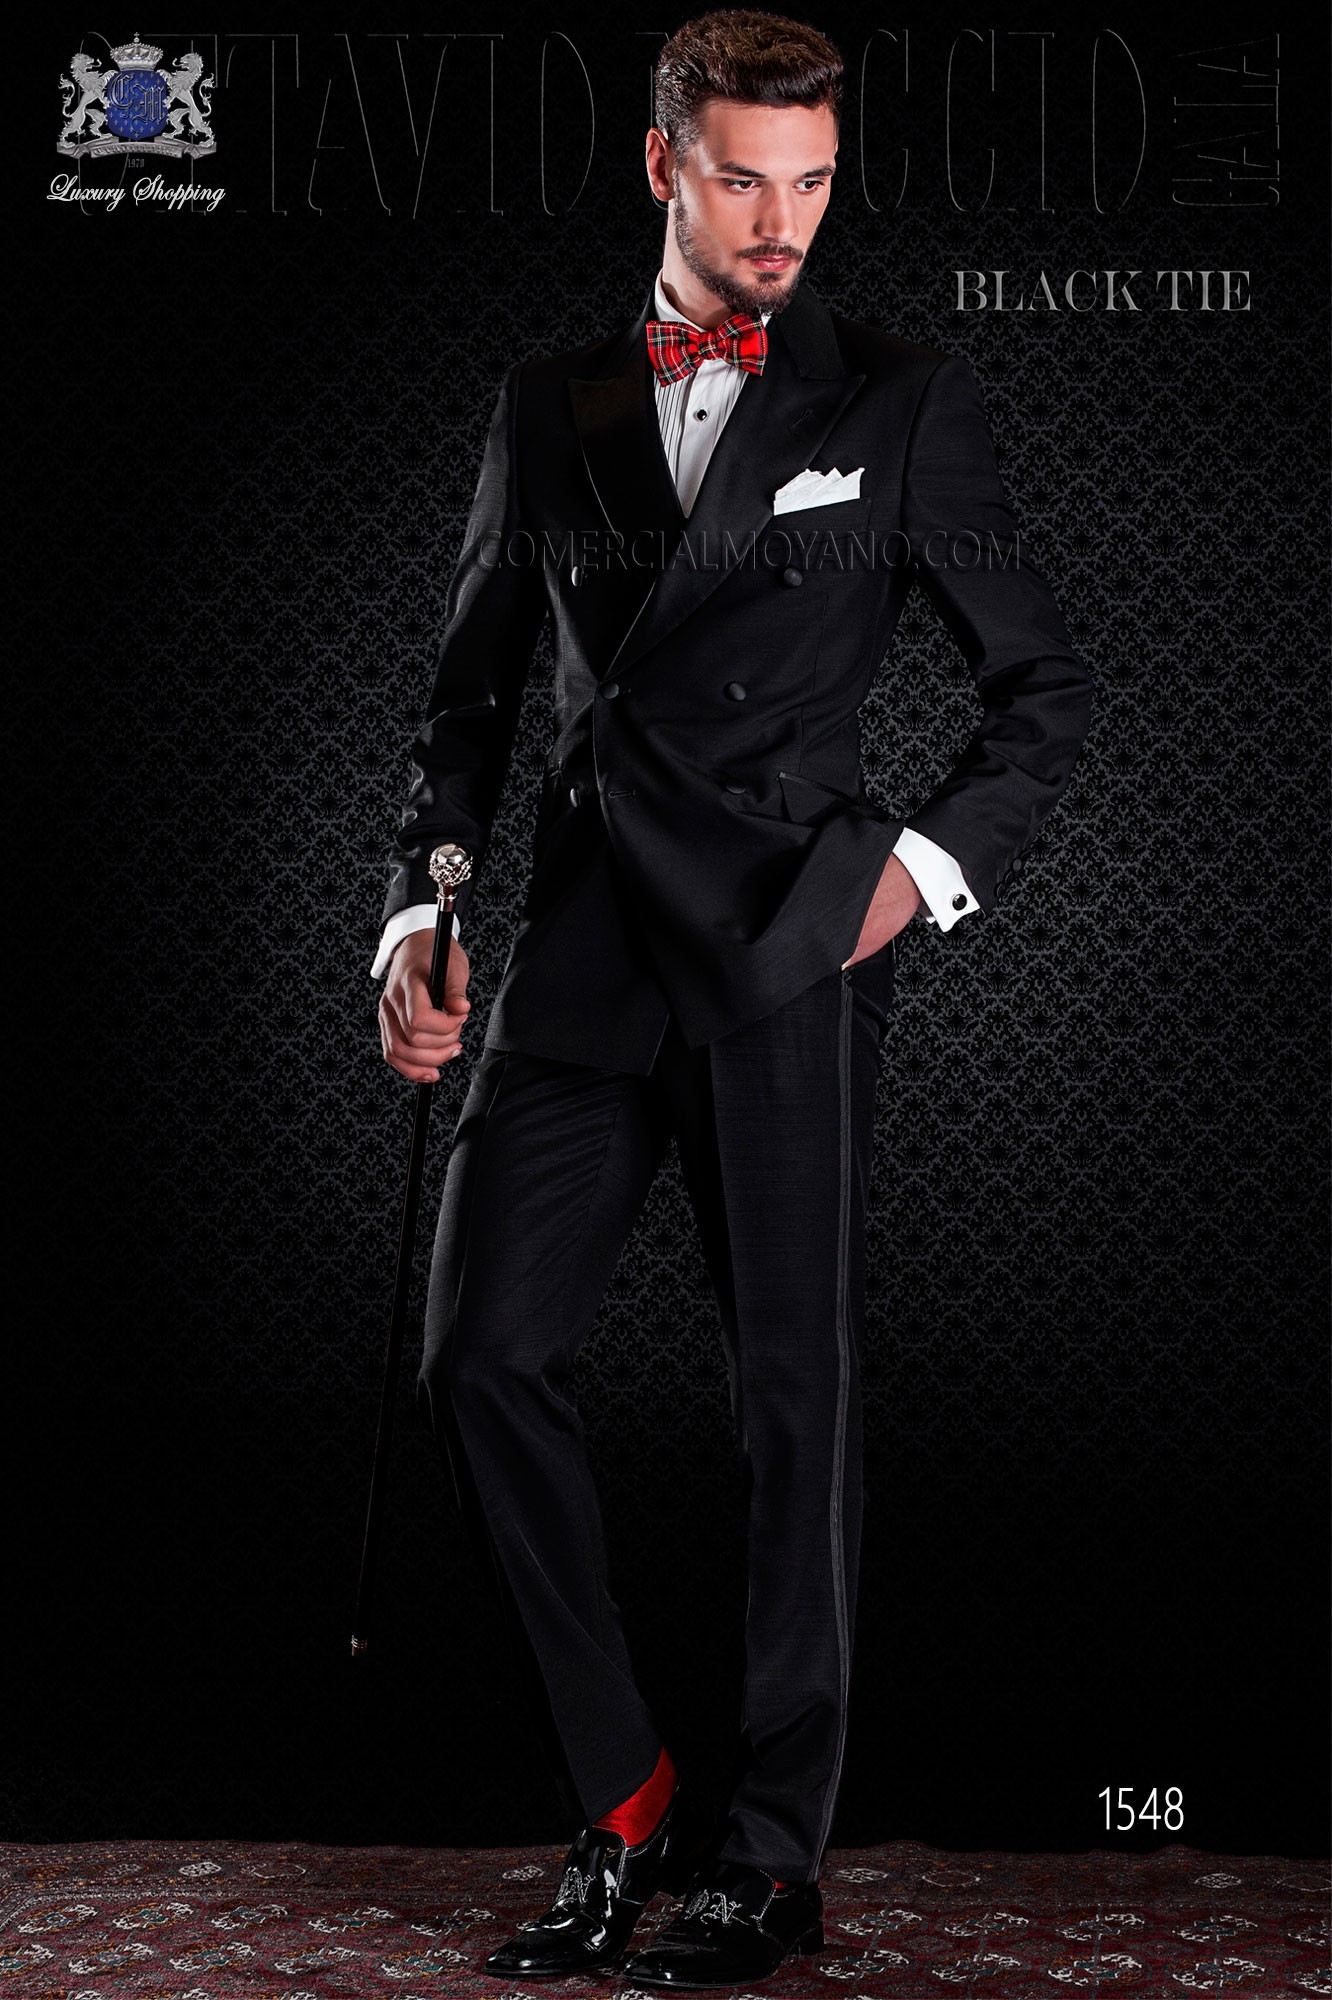 Esmoquin italiano negro cruzado con solapas de raso. Modelo solapa de punta con 6 botones. Tejido mixto lana.